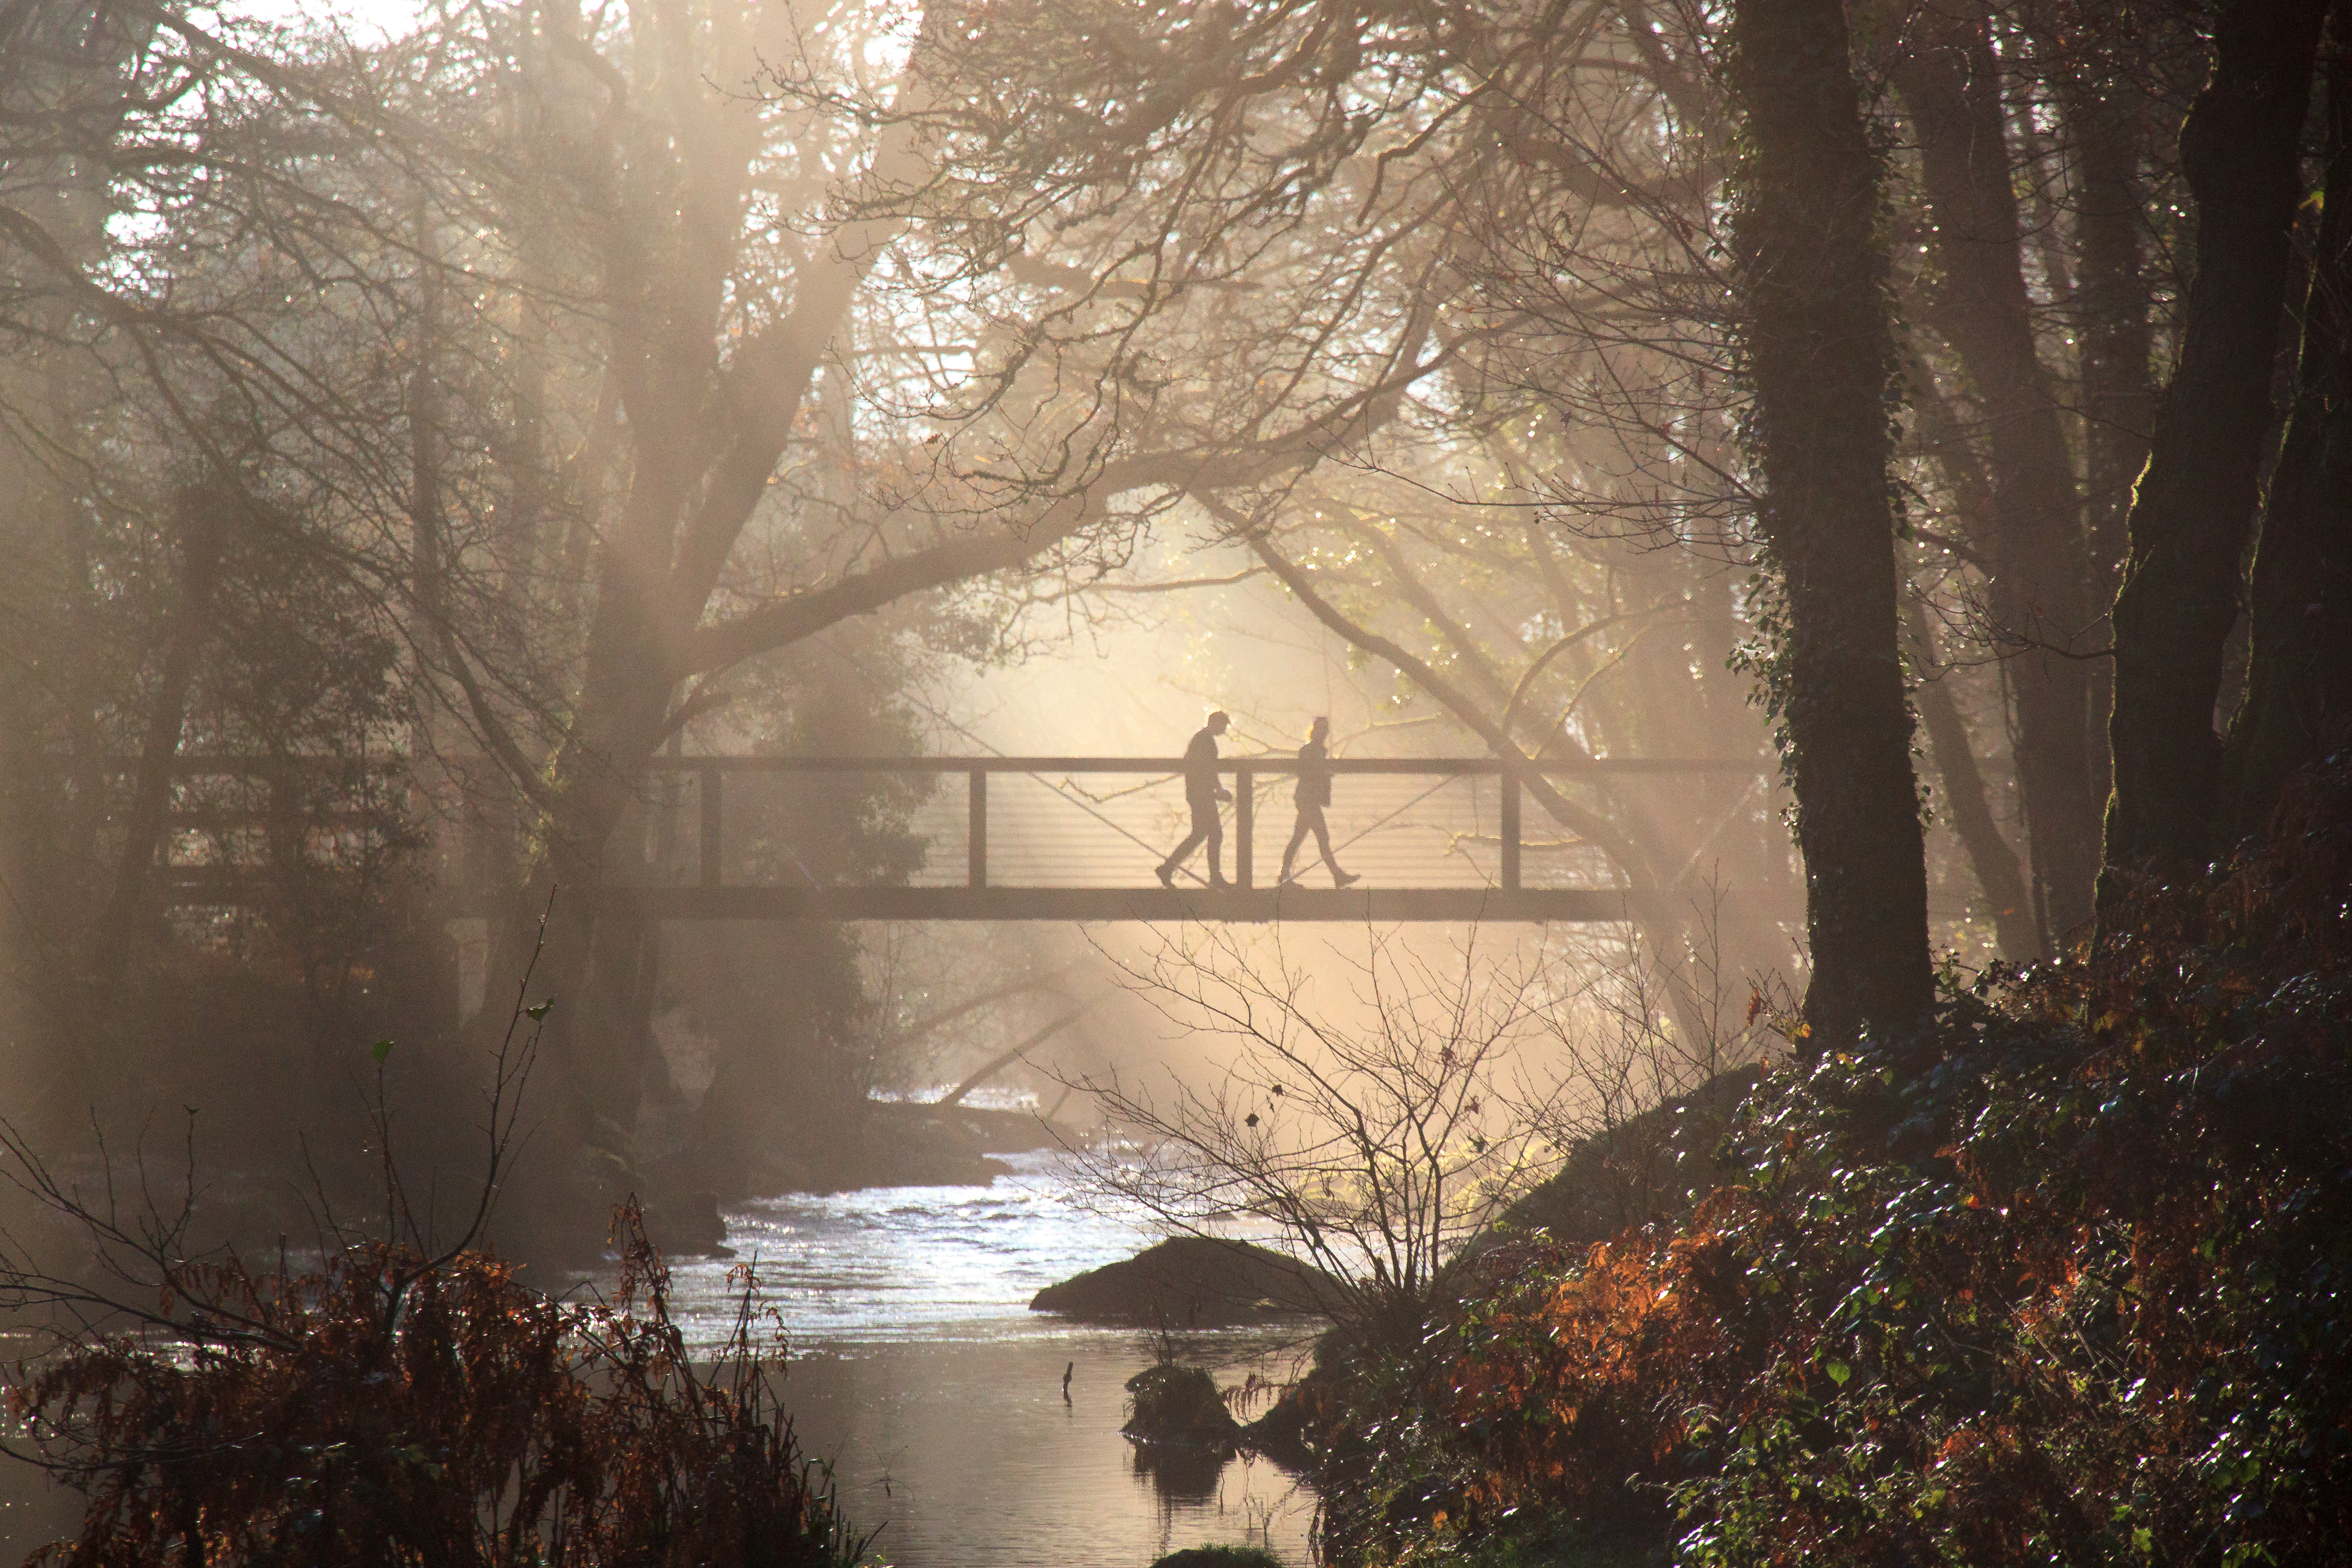 Footbridge Across the River Teign near Dartmoor